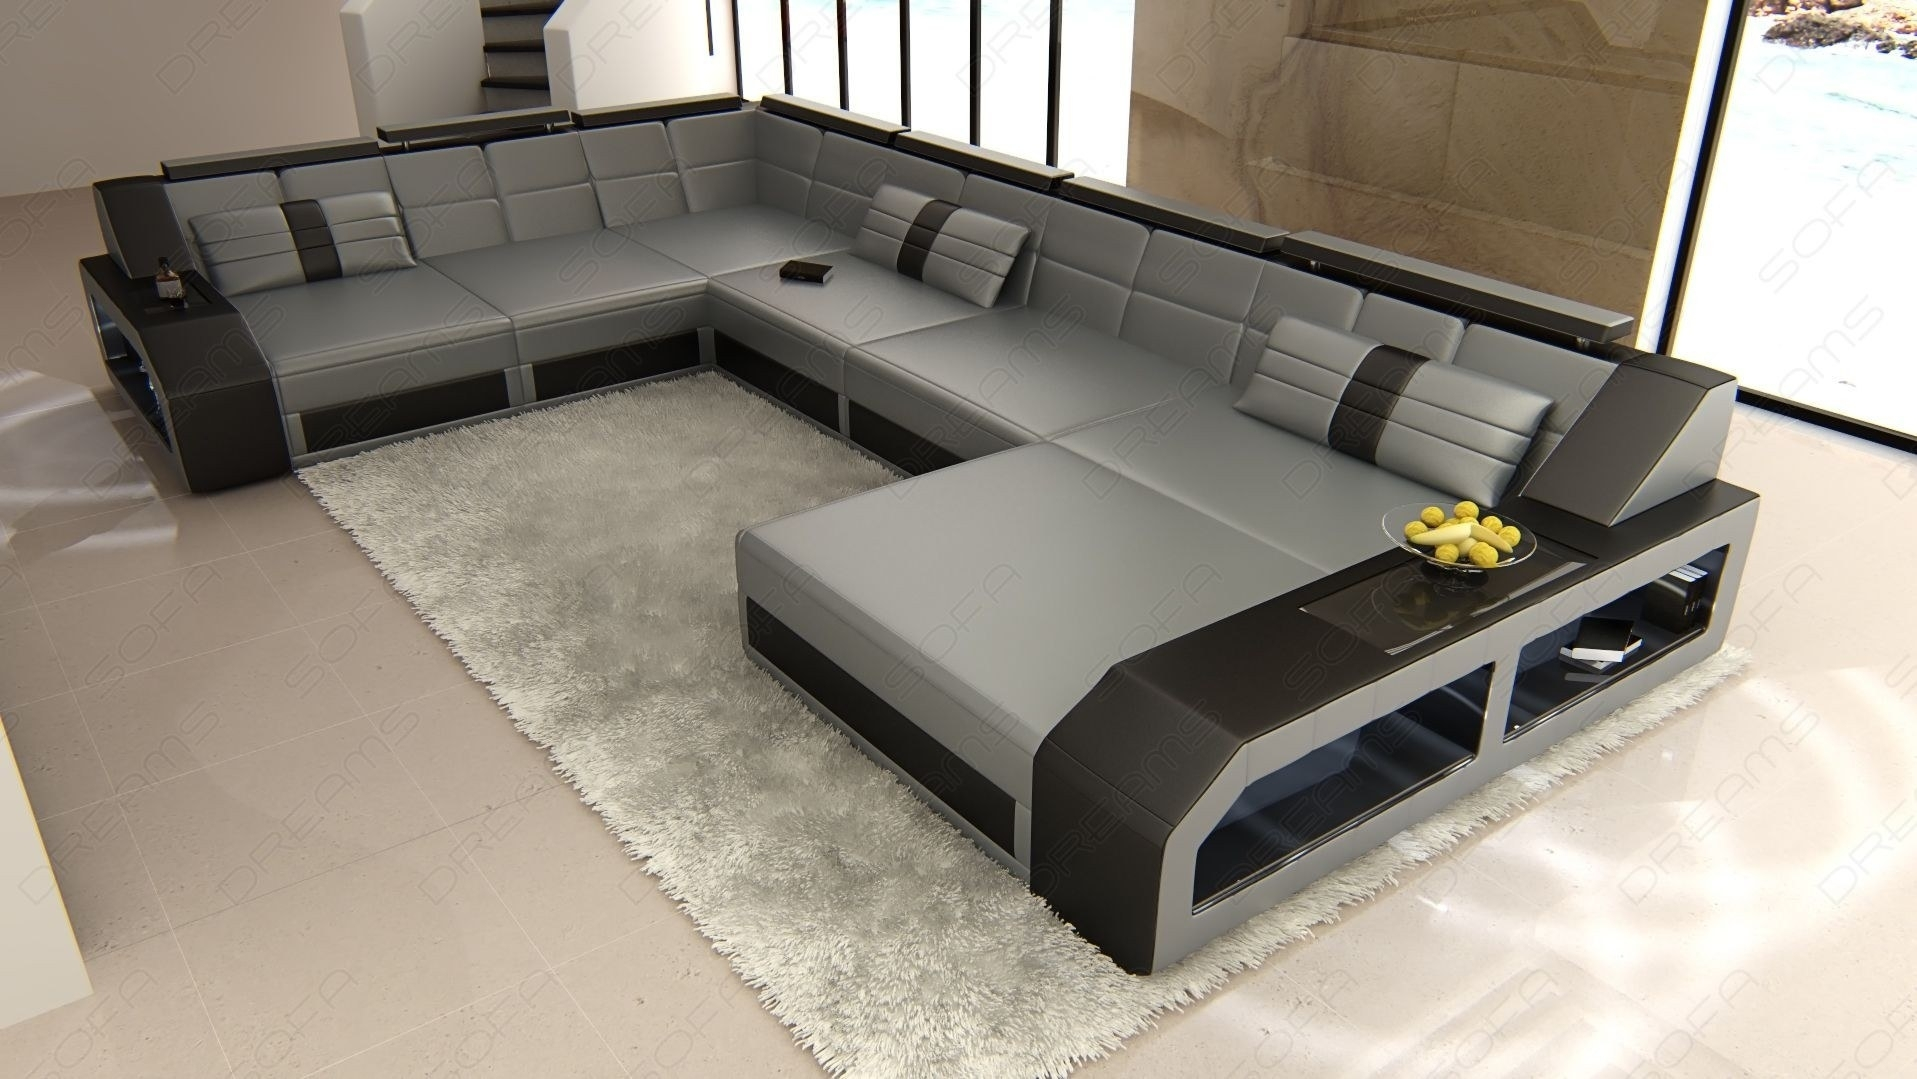 Sectional Leather Sofa Houston Xl Pertaining To Houston Sectional Sofas (View 9 of 10)